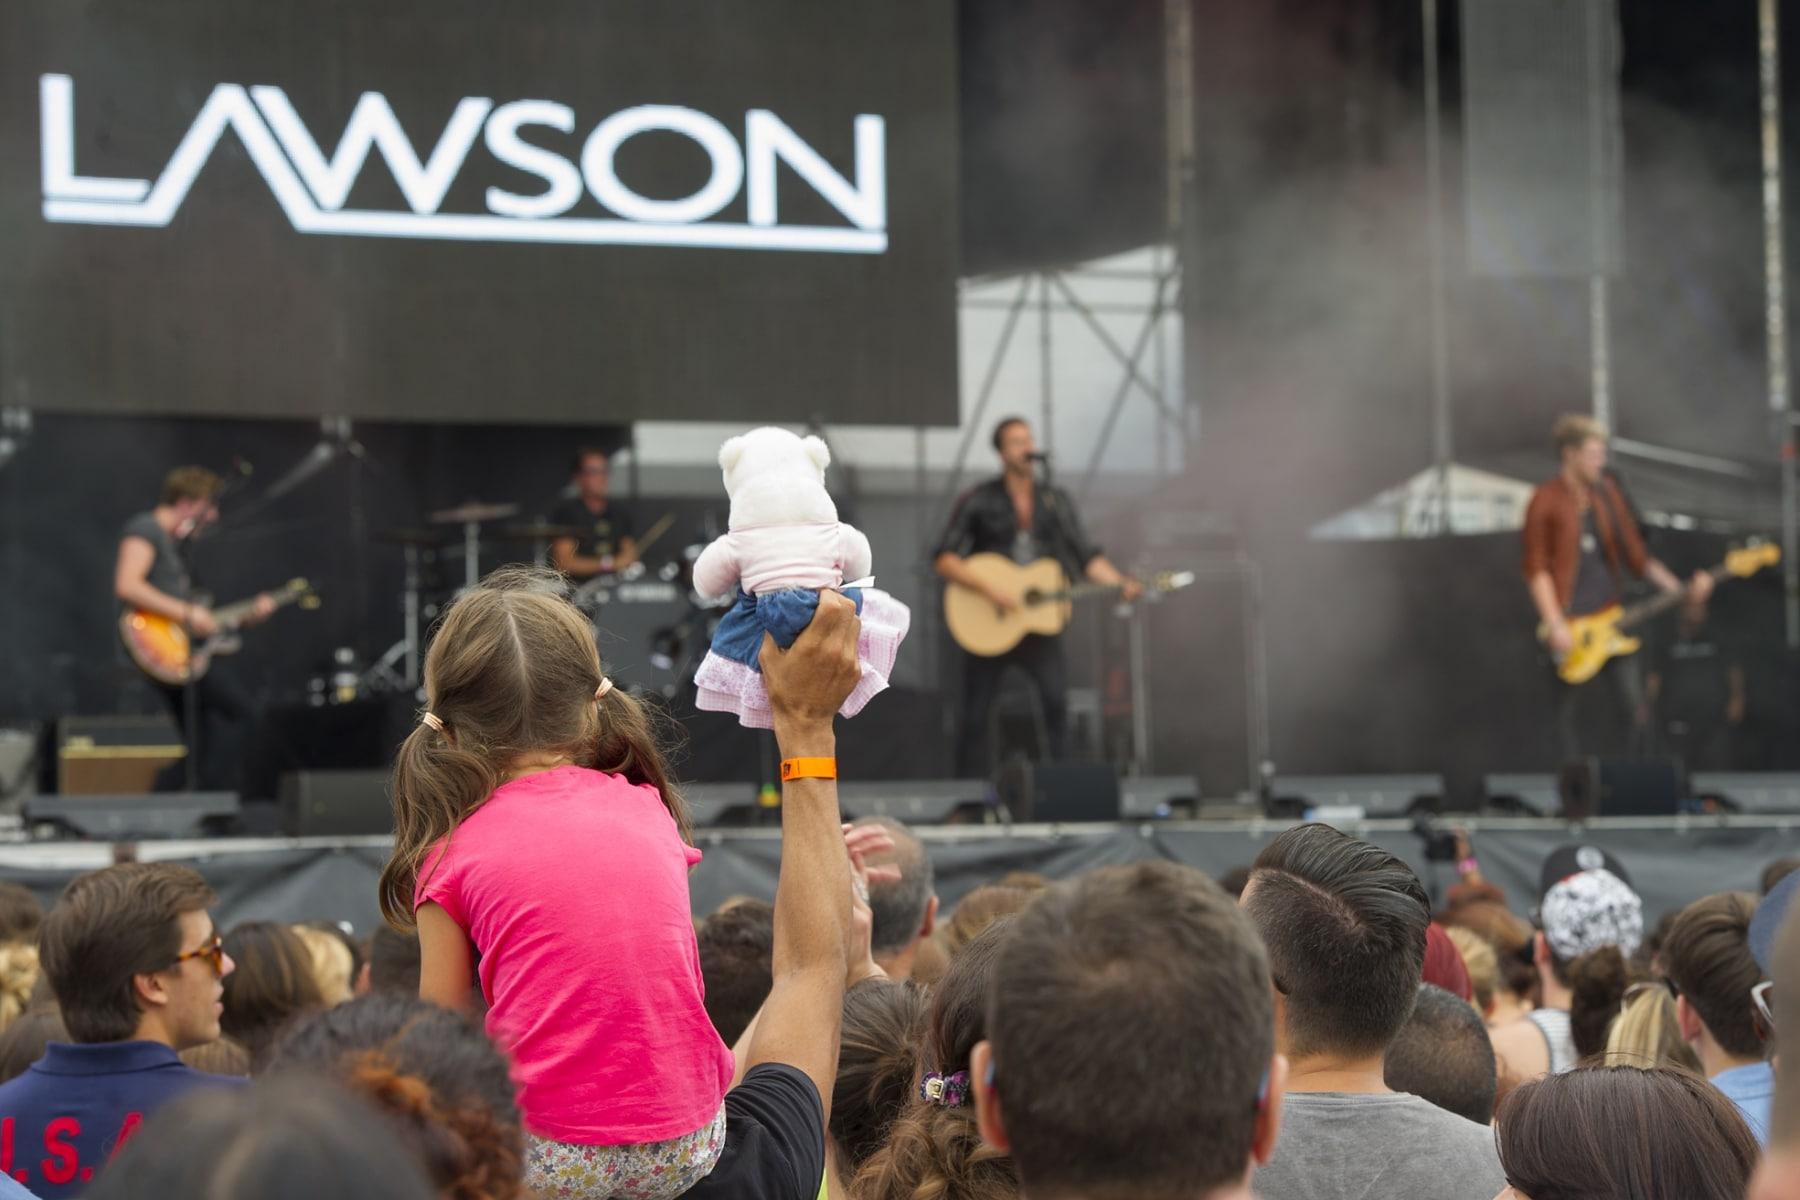 gibraltar-music-festival-2013-lawson_9699904439_o